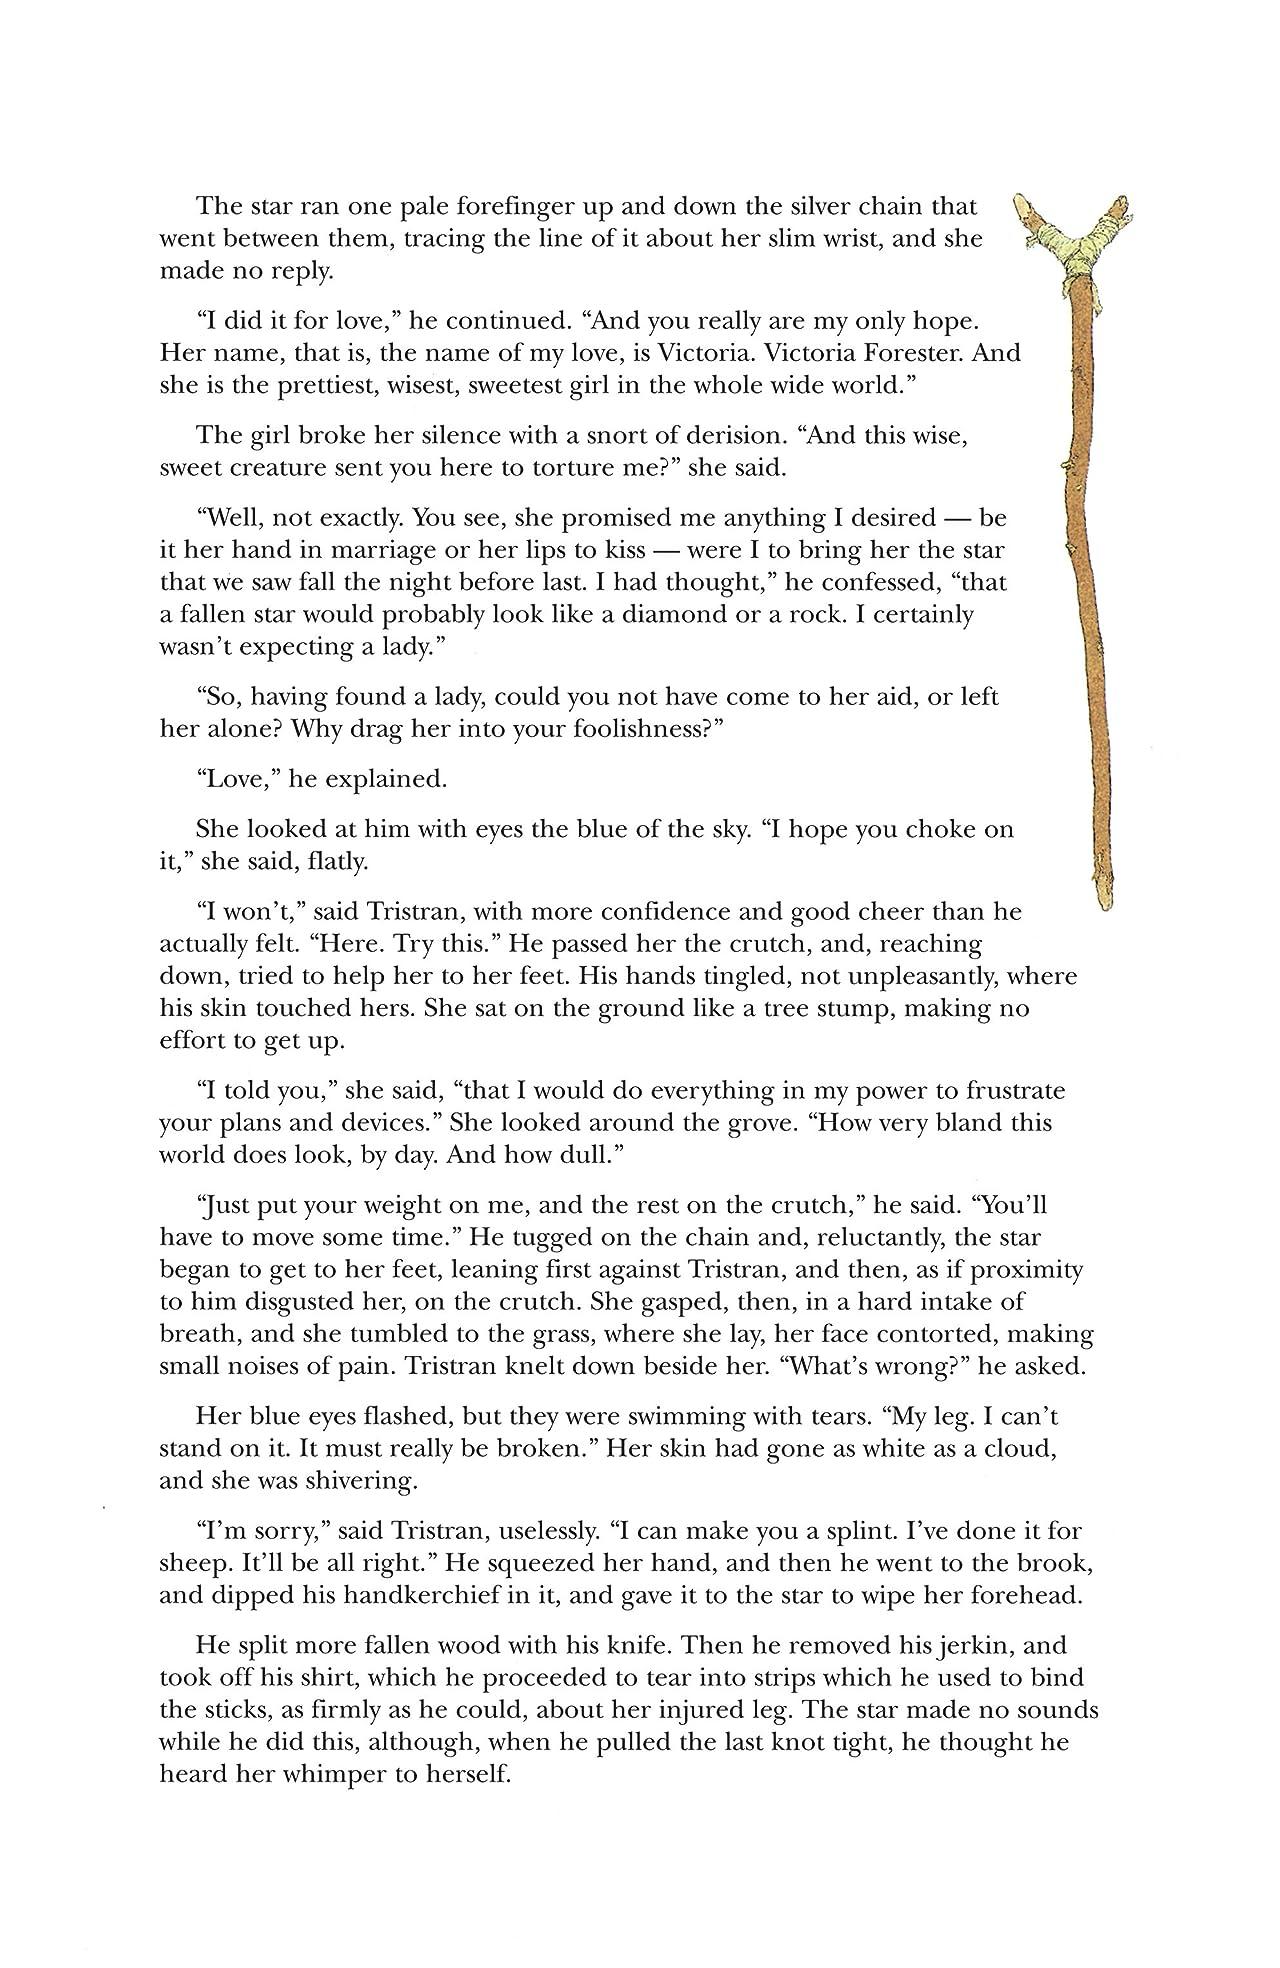 Neil Gaiman And Charles Vess' Stardust #3